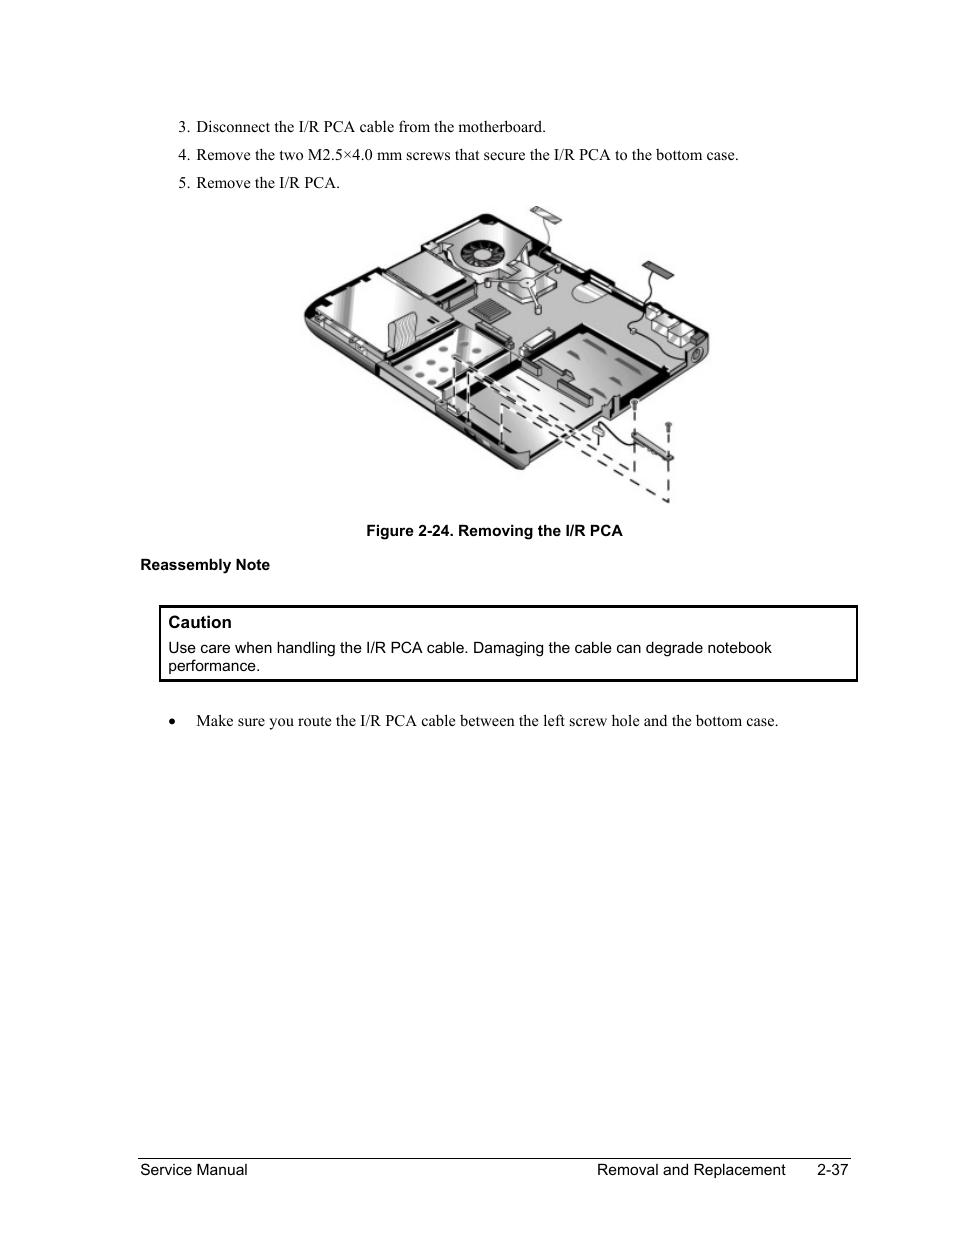 Figure 2-24. removing the i/r pca -37 | HP Pavilion